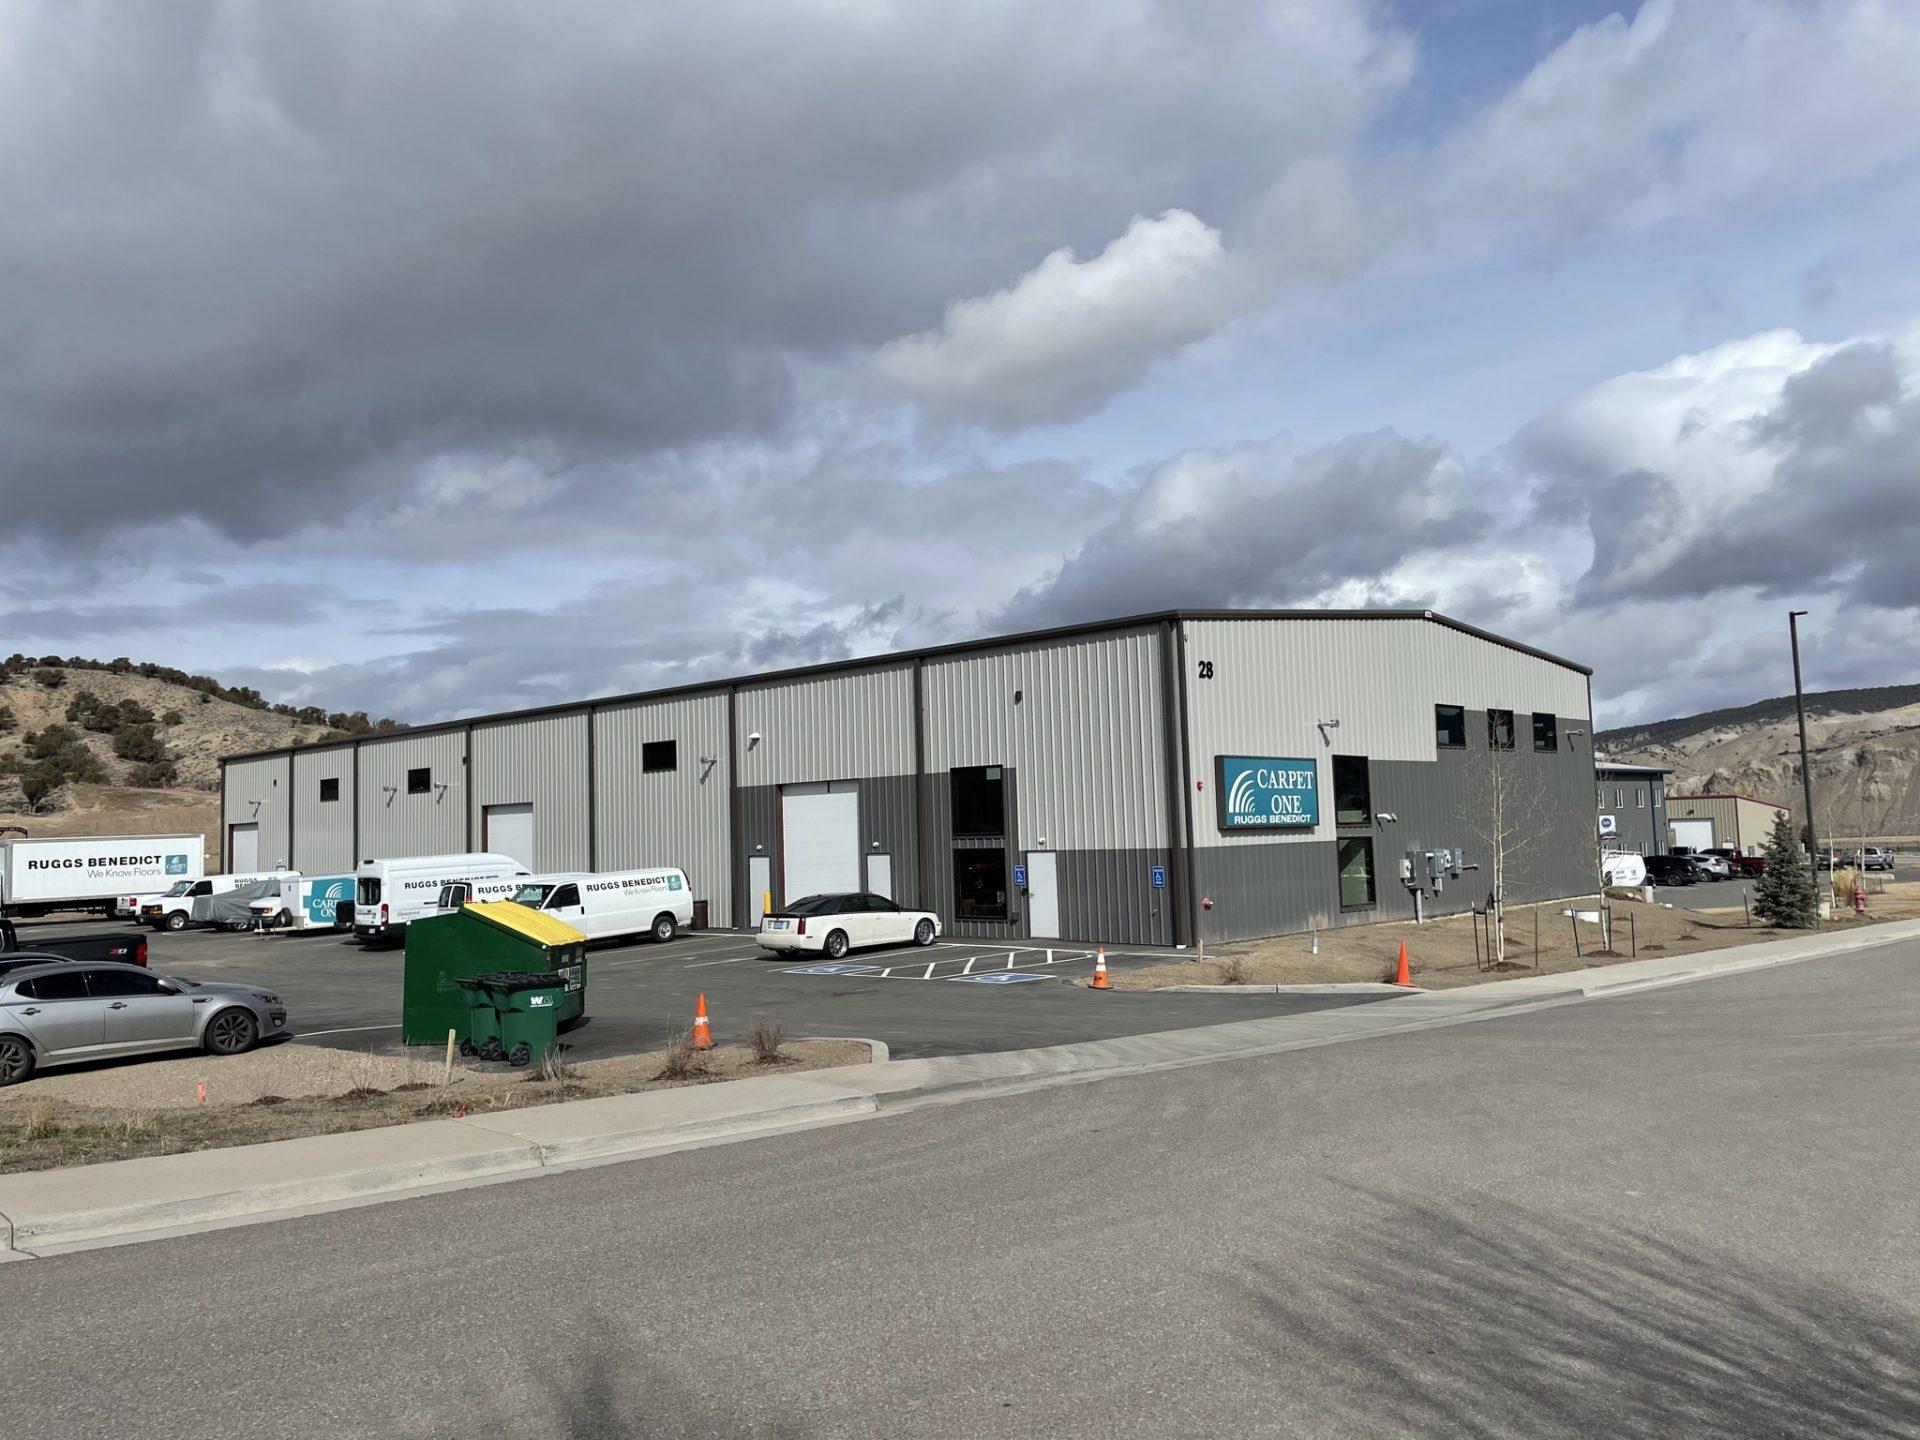 Ruggs Warehouse